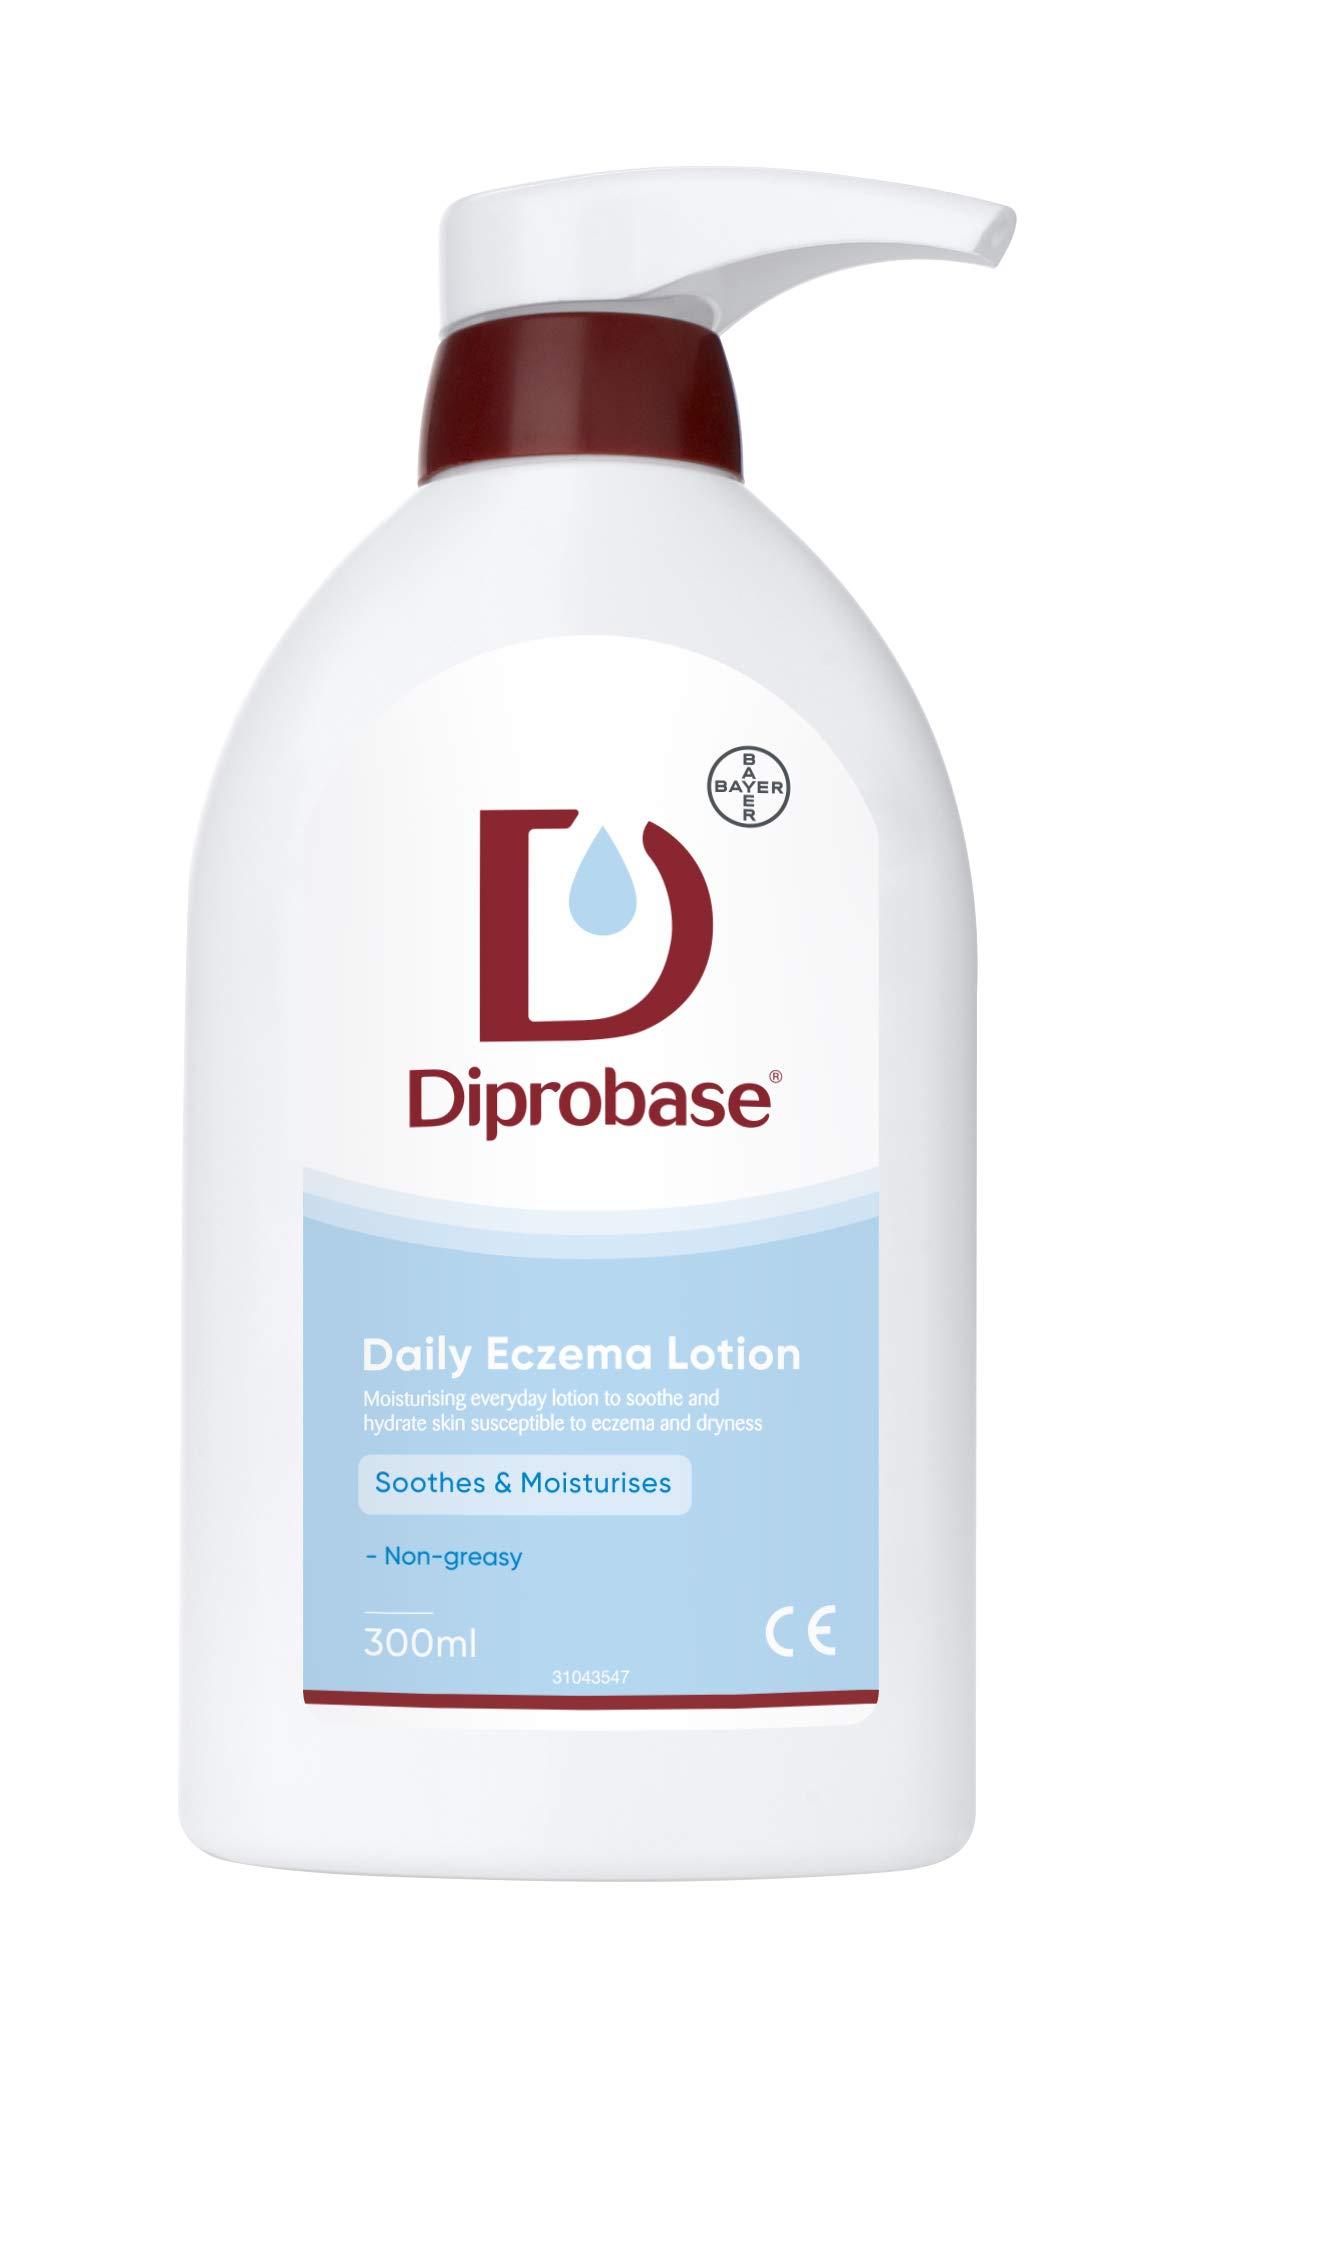 Diprobase Daily Eczema Lotion 300 ml Moisturiser for Eczema Prone and Dry Skin